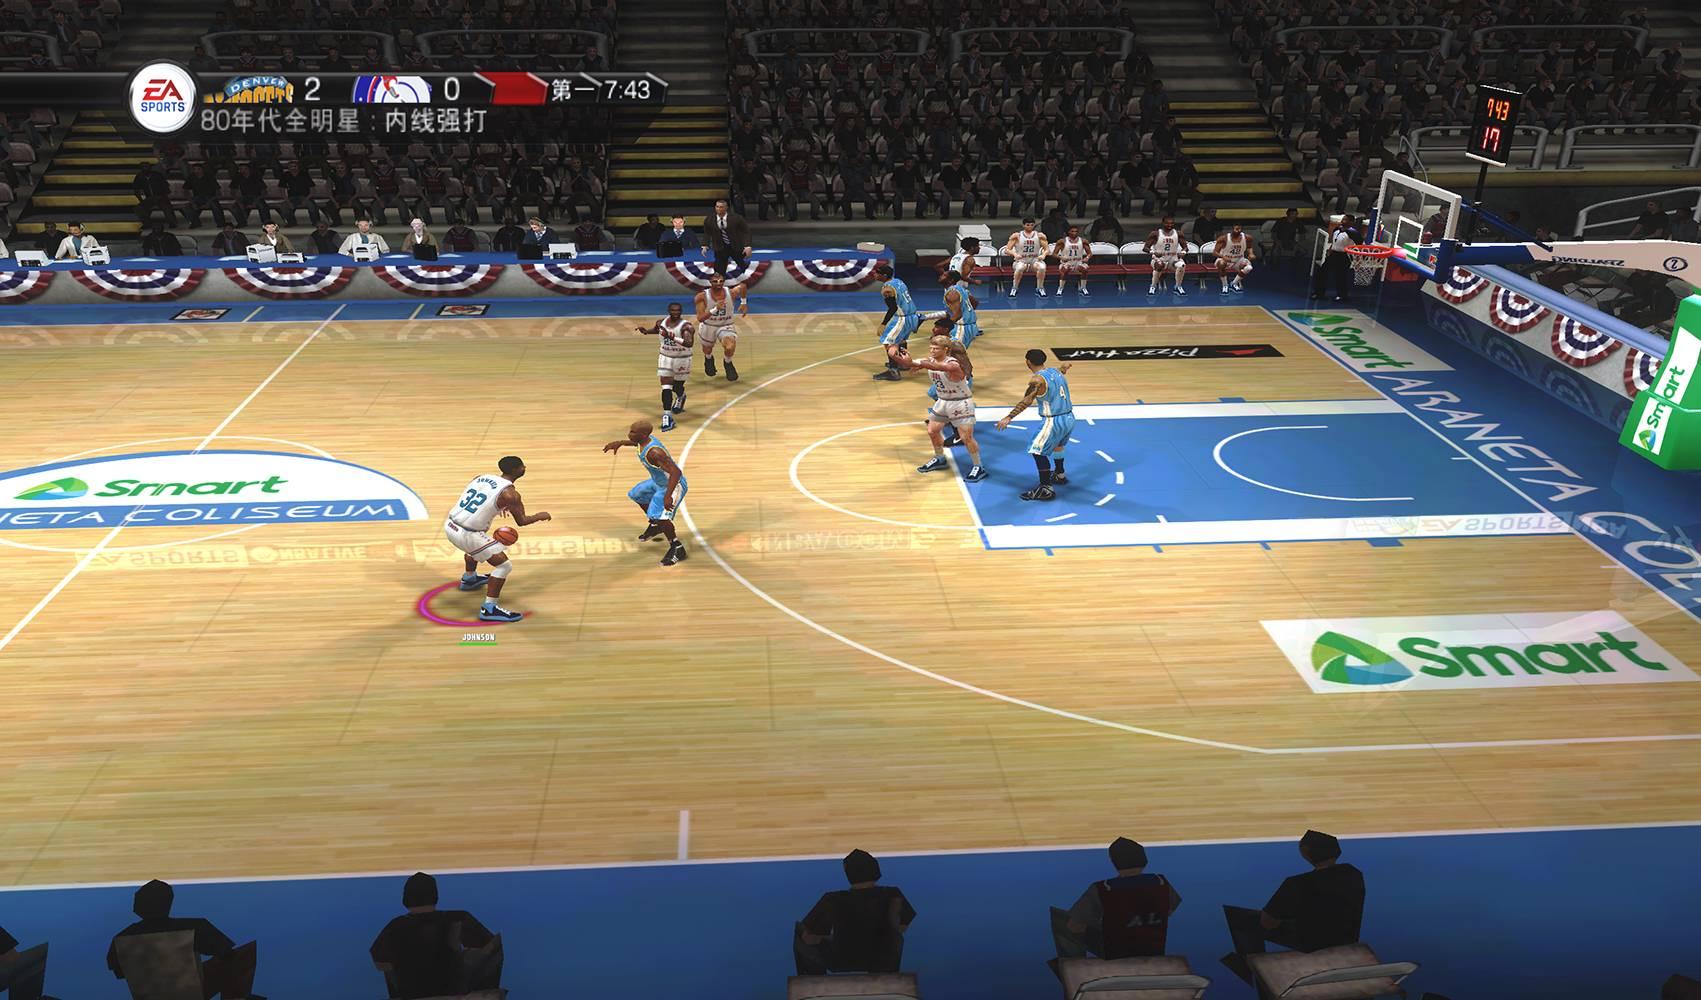 NBA LIVE 08【2K】-2021-03-31-01-23-50-073副本.jpg